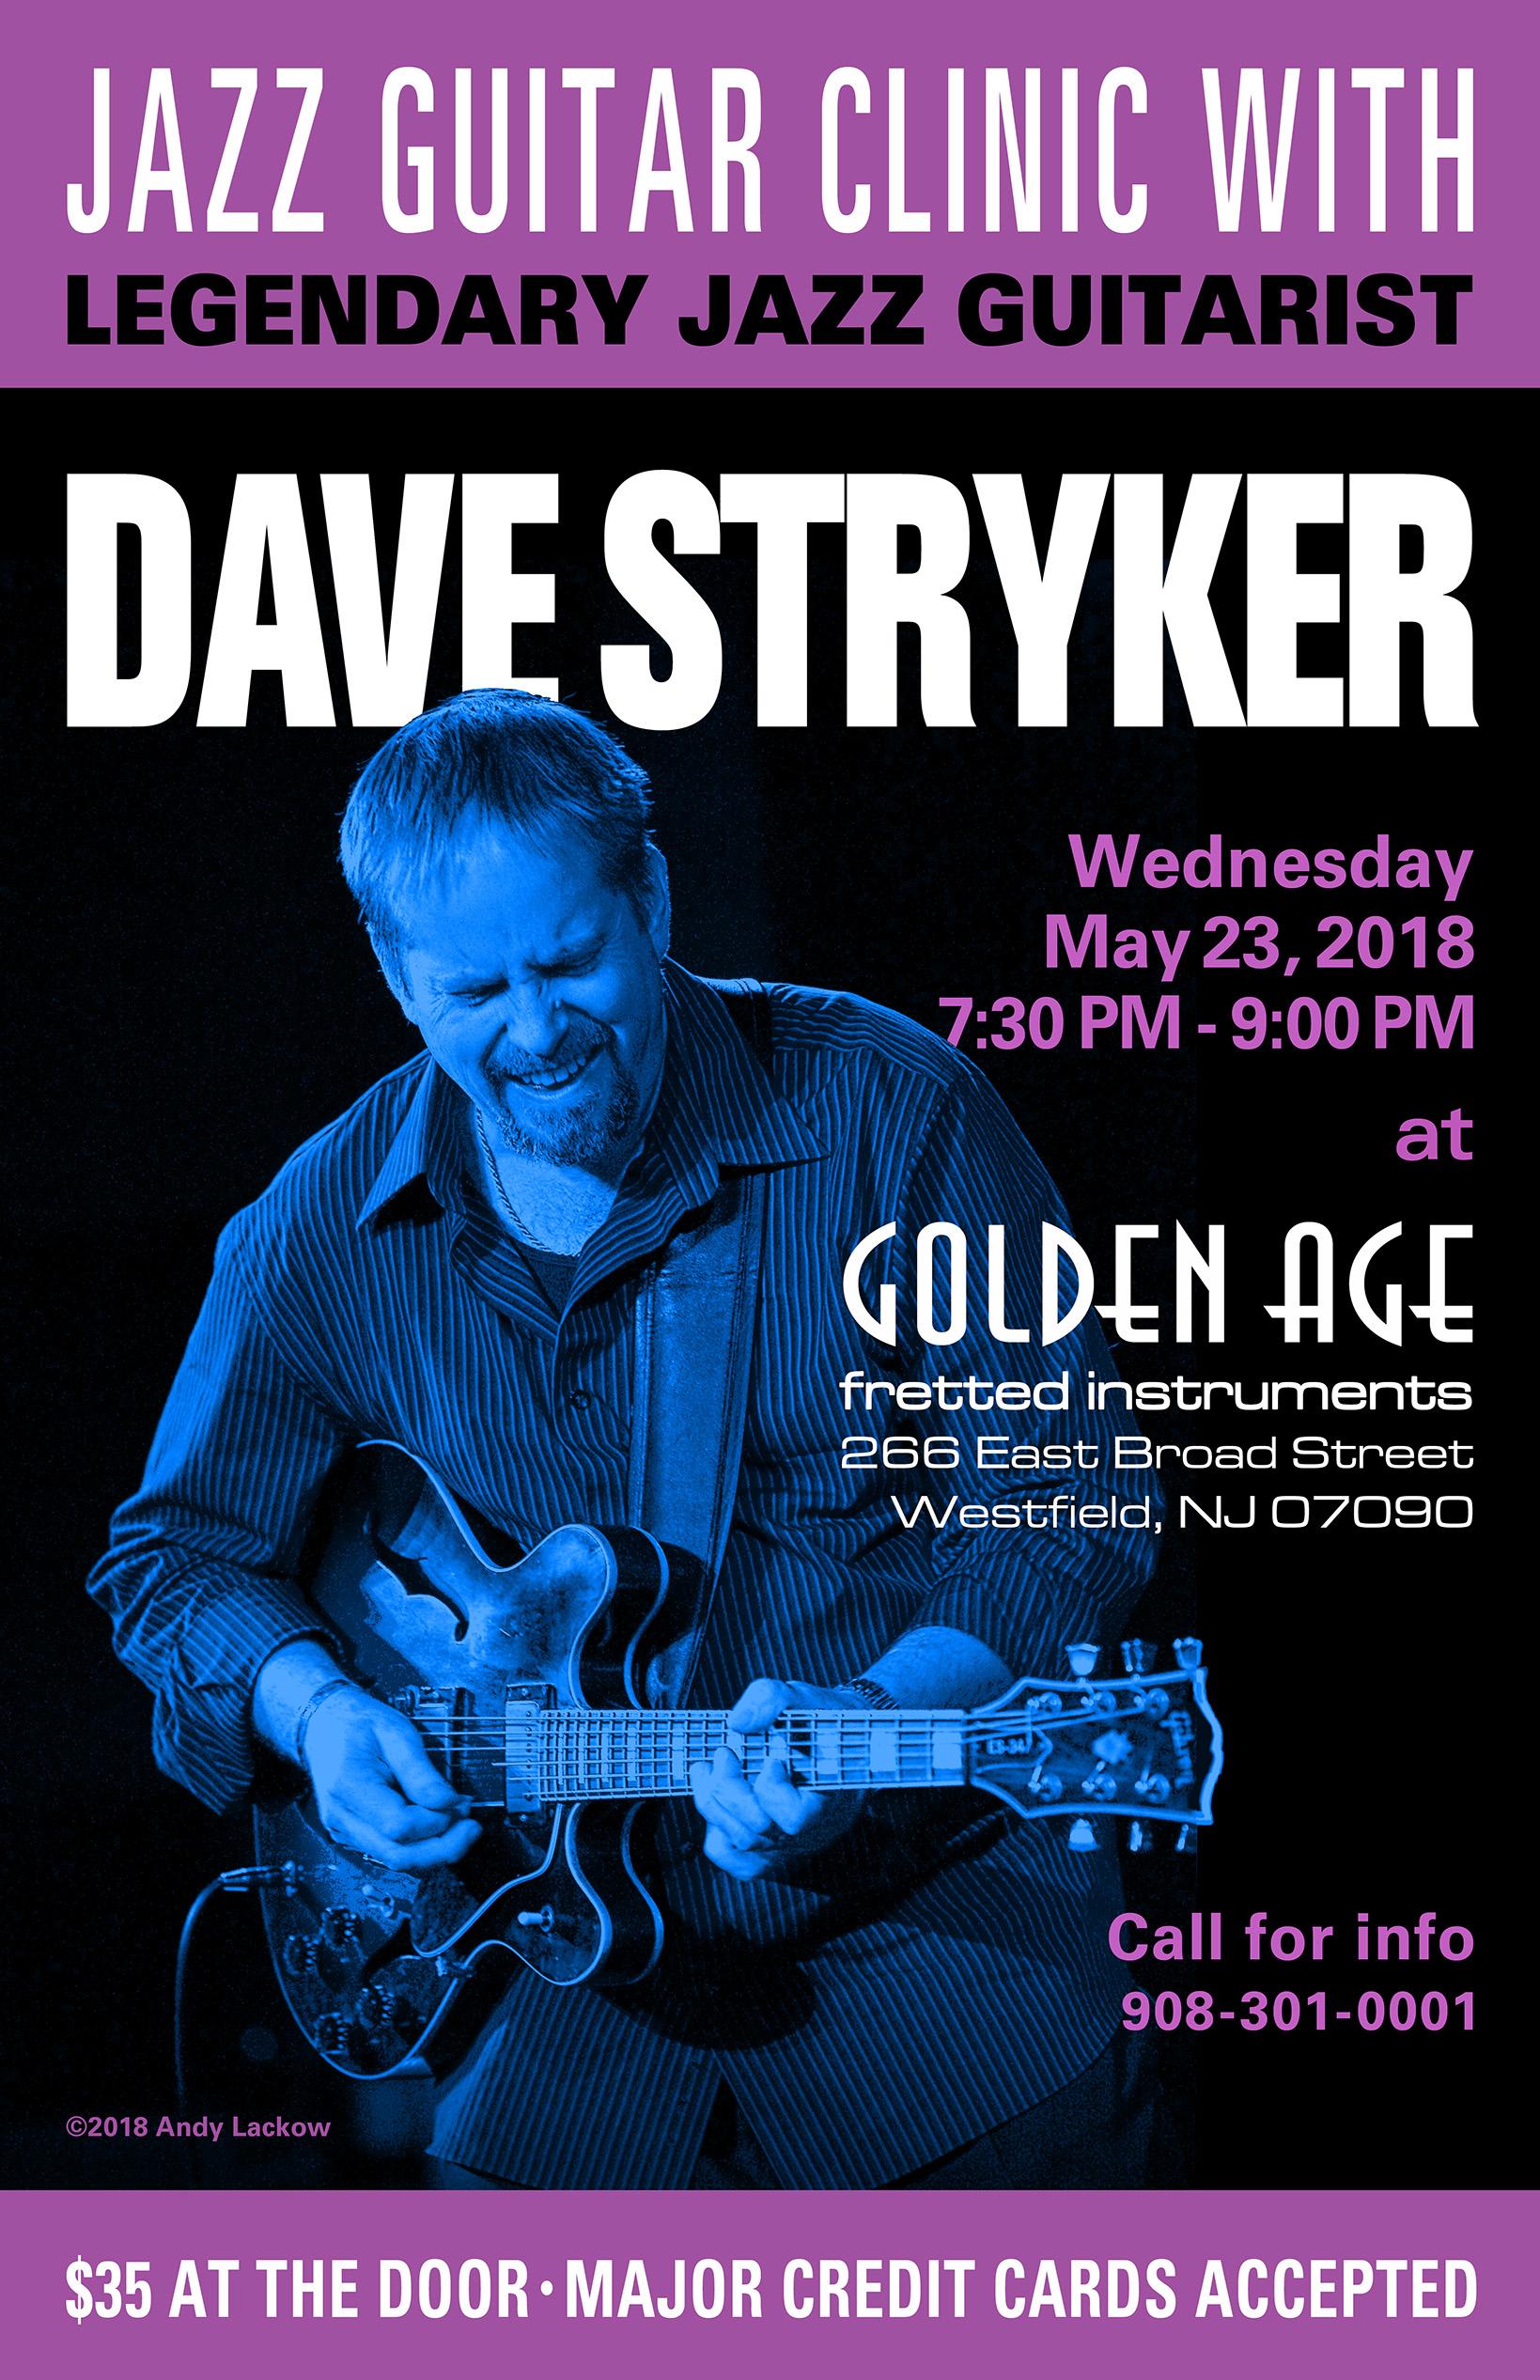 Dave Stryker Jazz Guitar Clinic